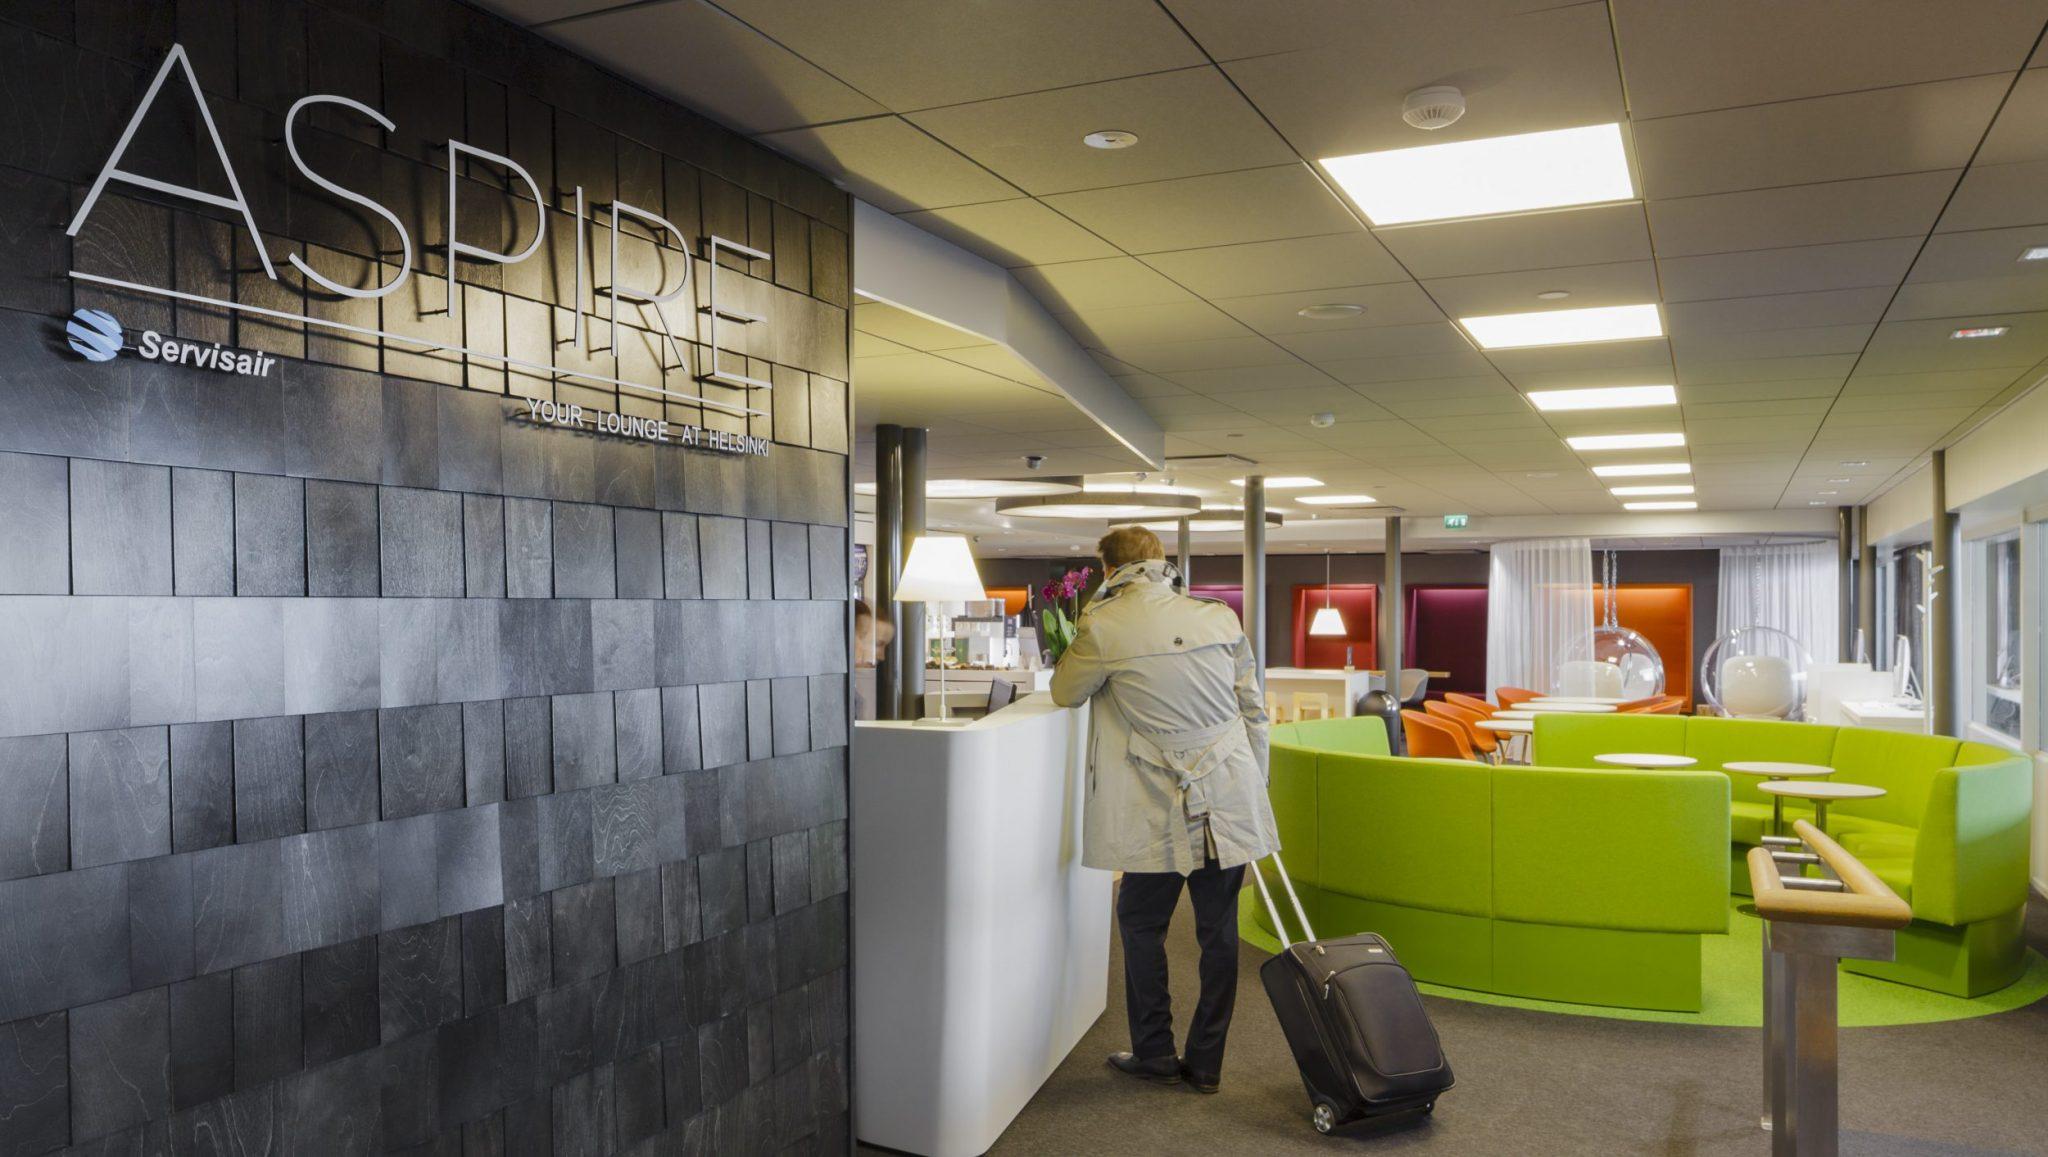 Servisair-Aspire-Airport-Lounge-Helsinki-Vantaa-GI-Project-5